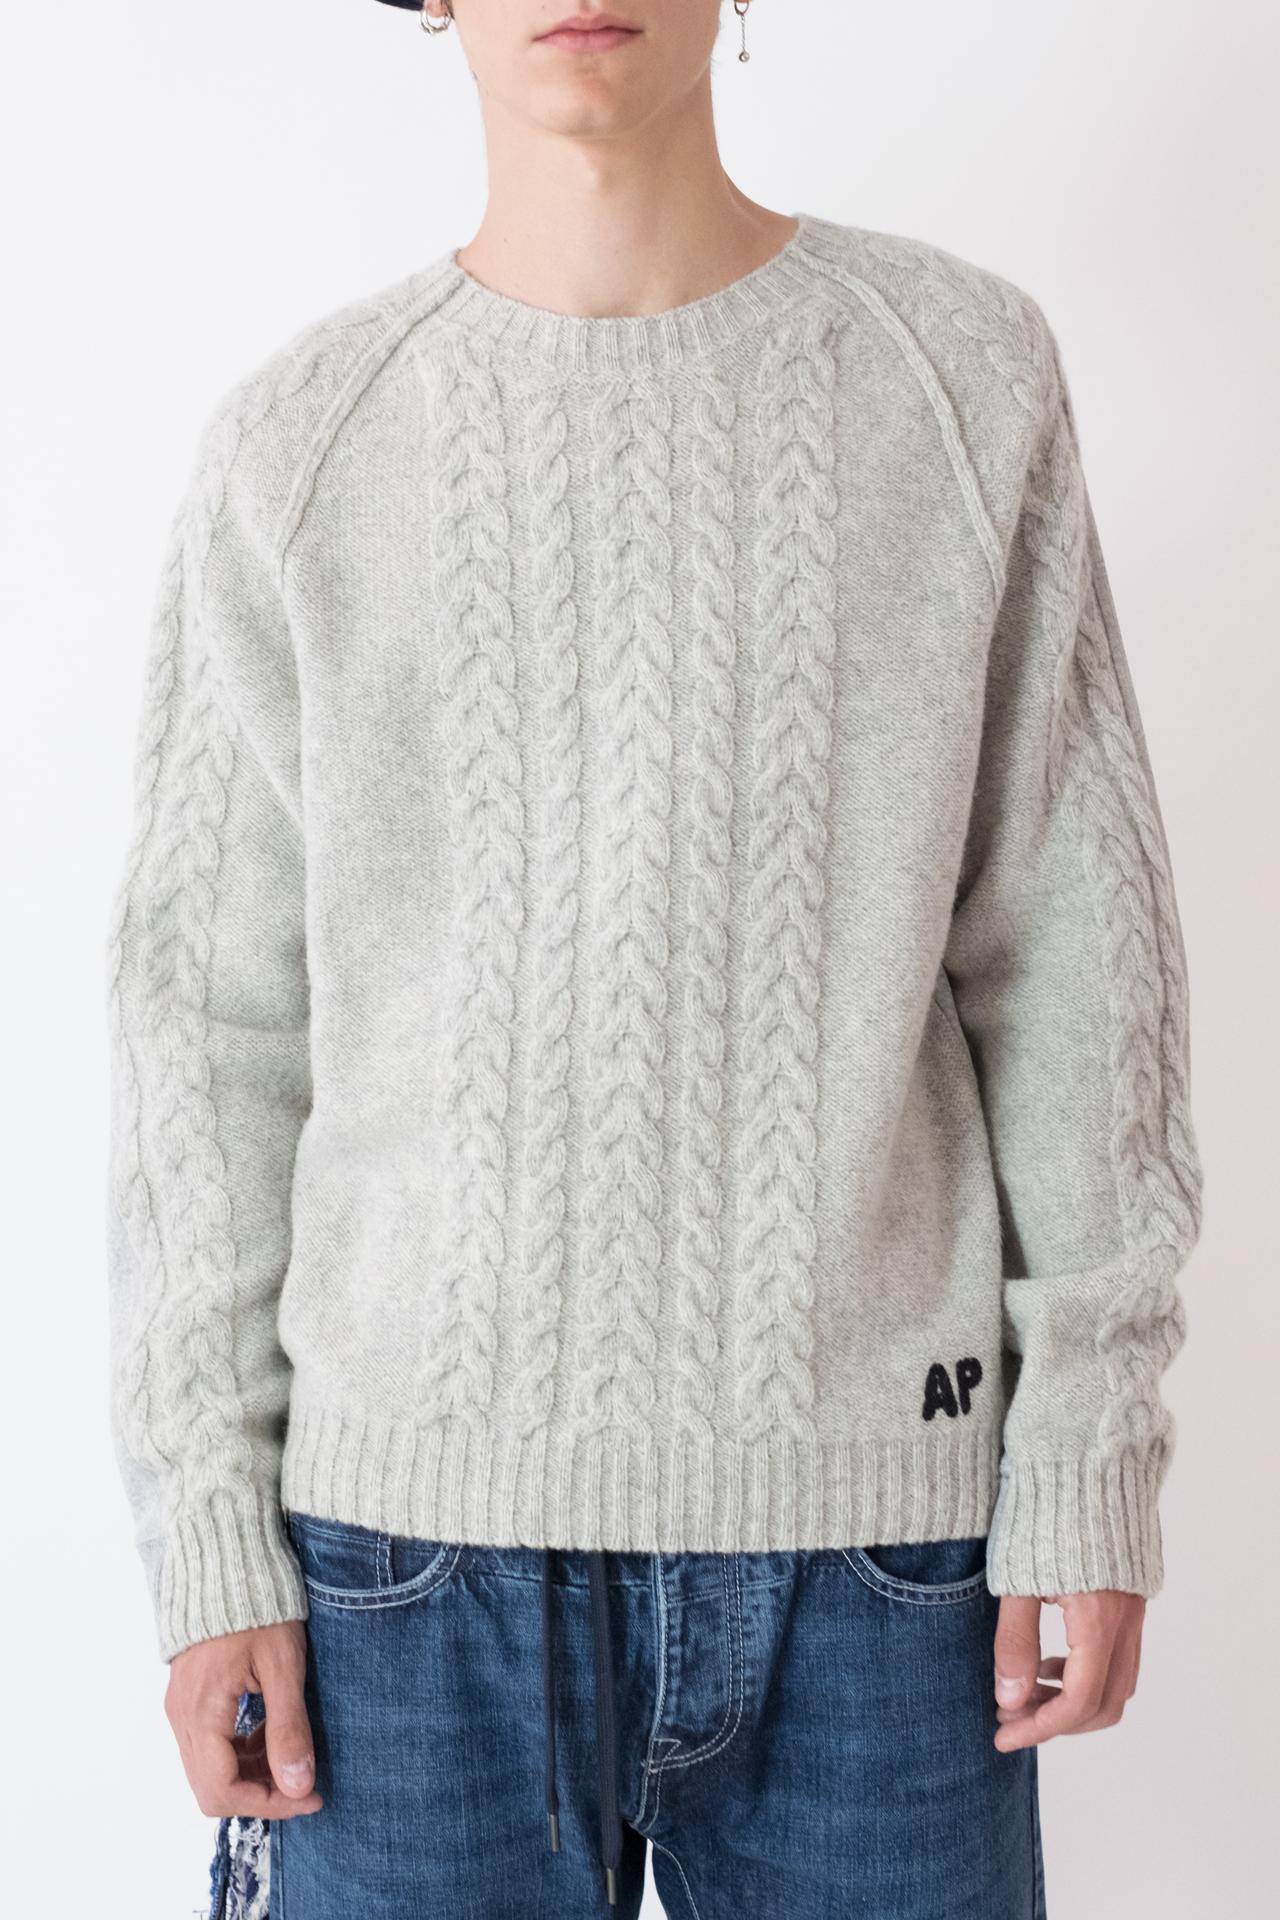 Andrea Pompilio Knitwear Oonark